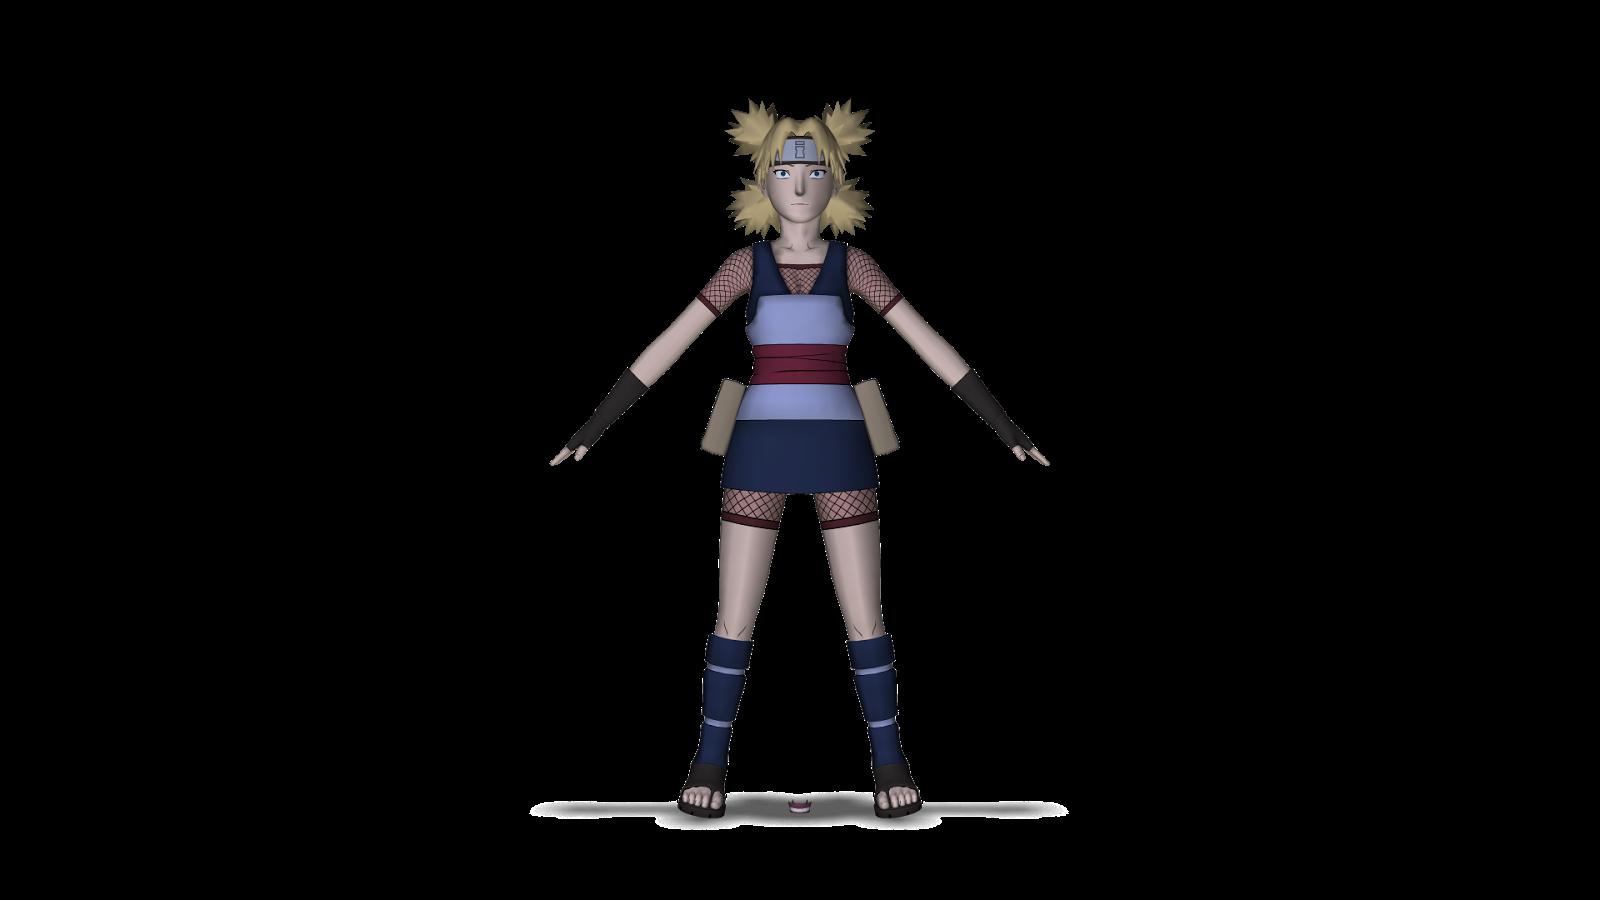 Naruto Shippuden Anime Kage